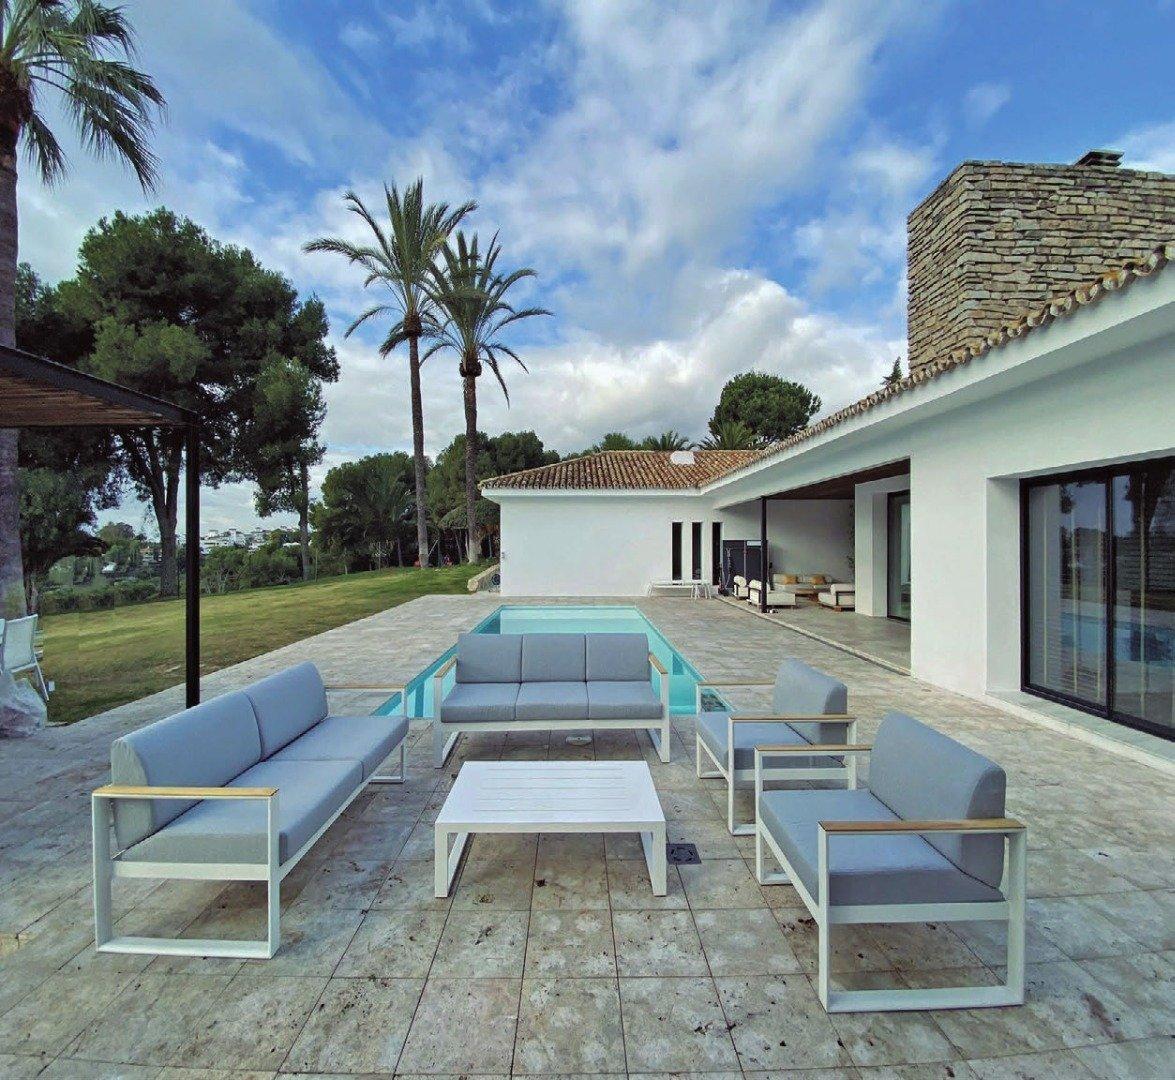 Furniture Specialists in Estepona